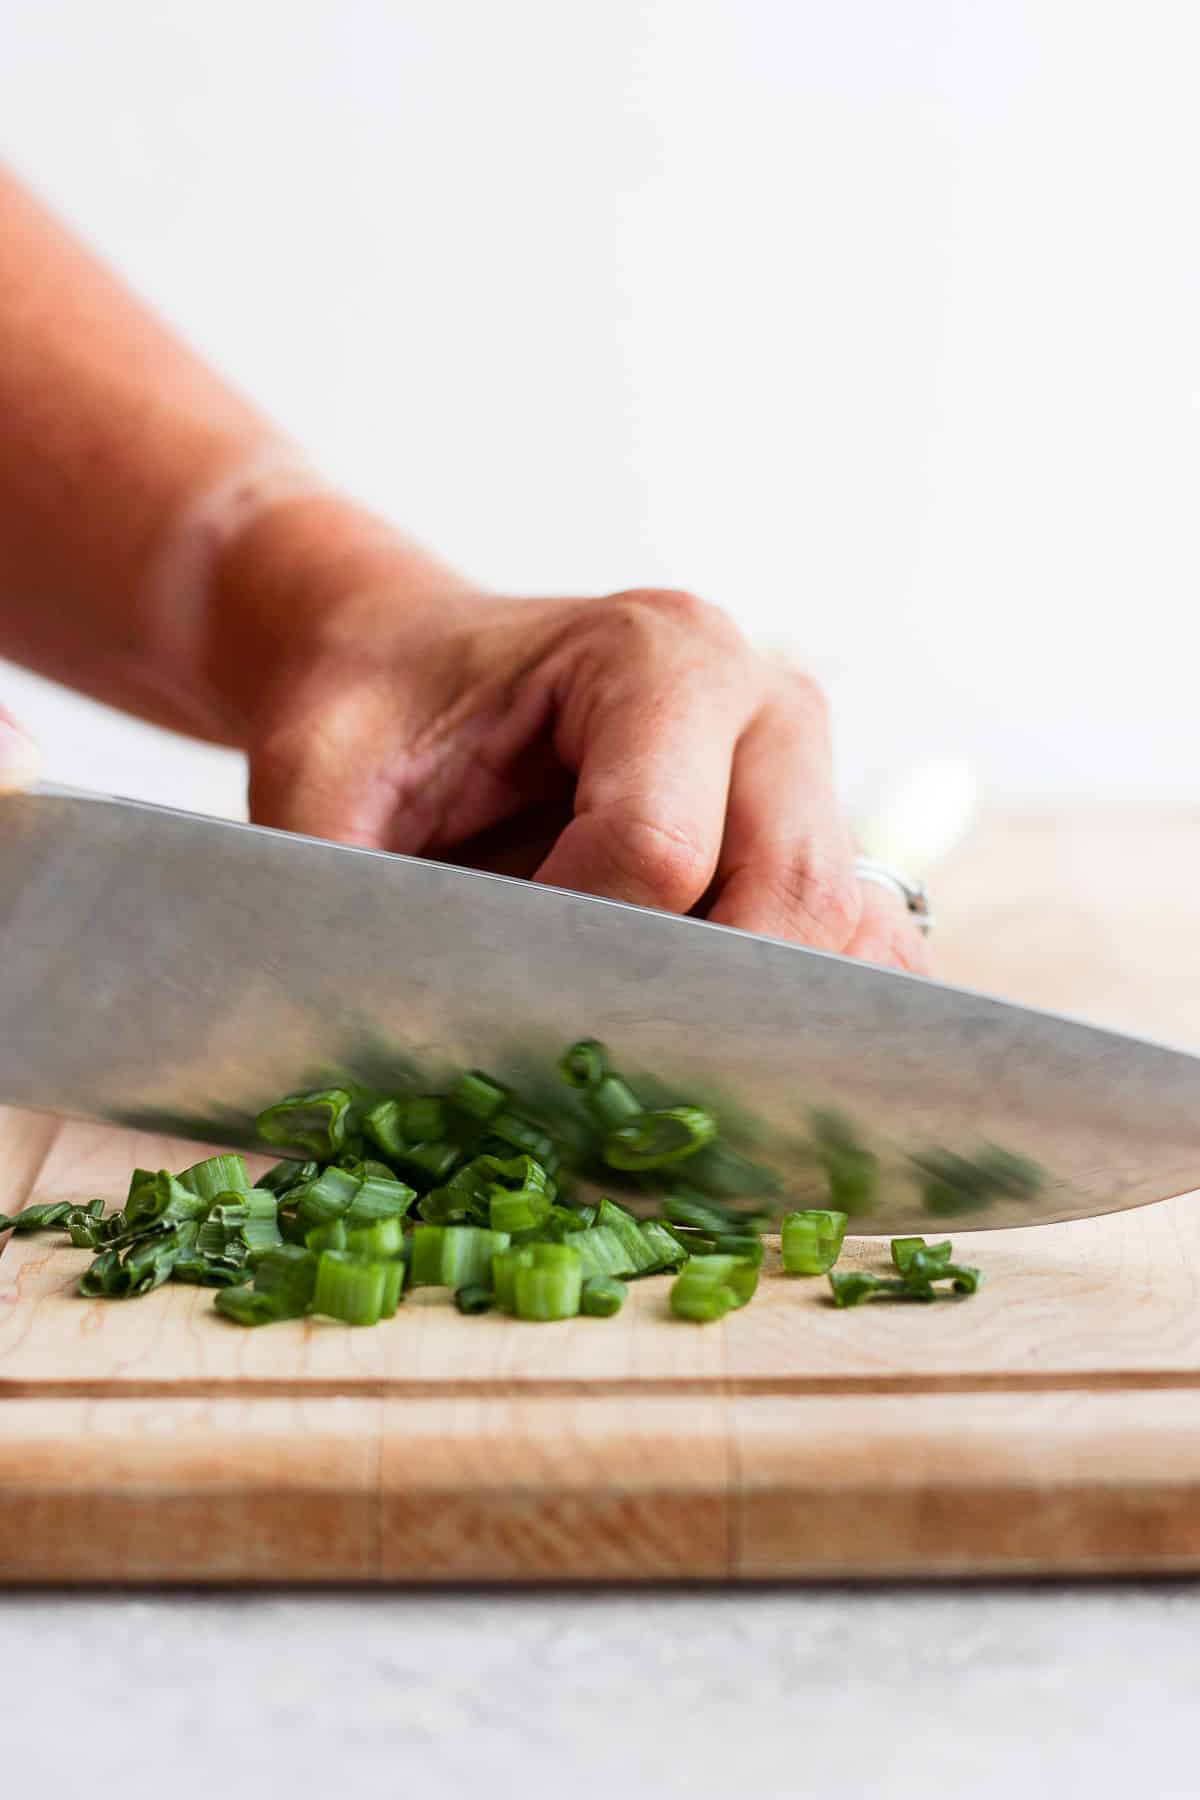 Chopping green onions on cutting board